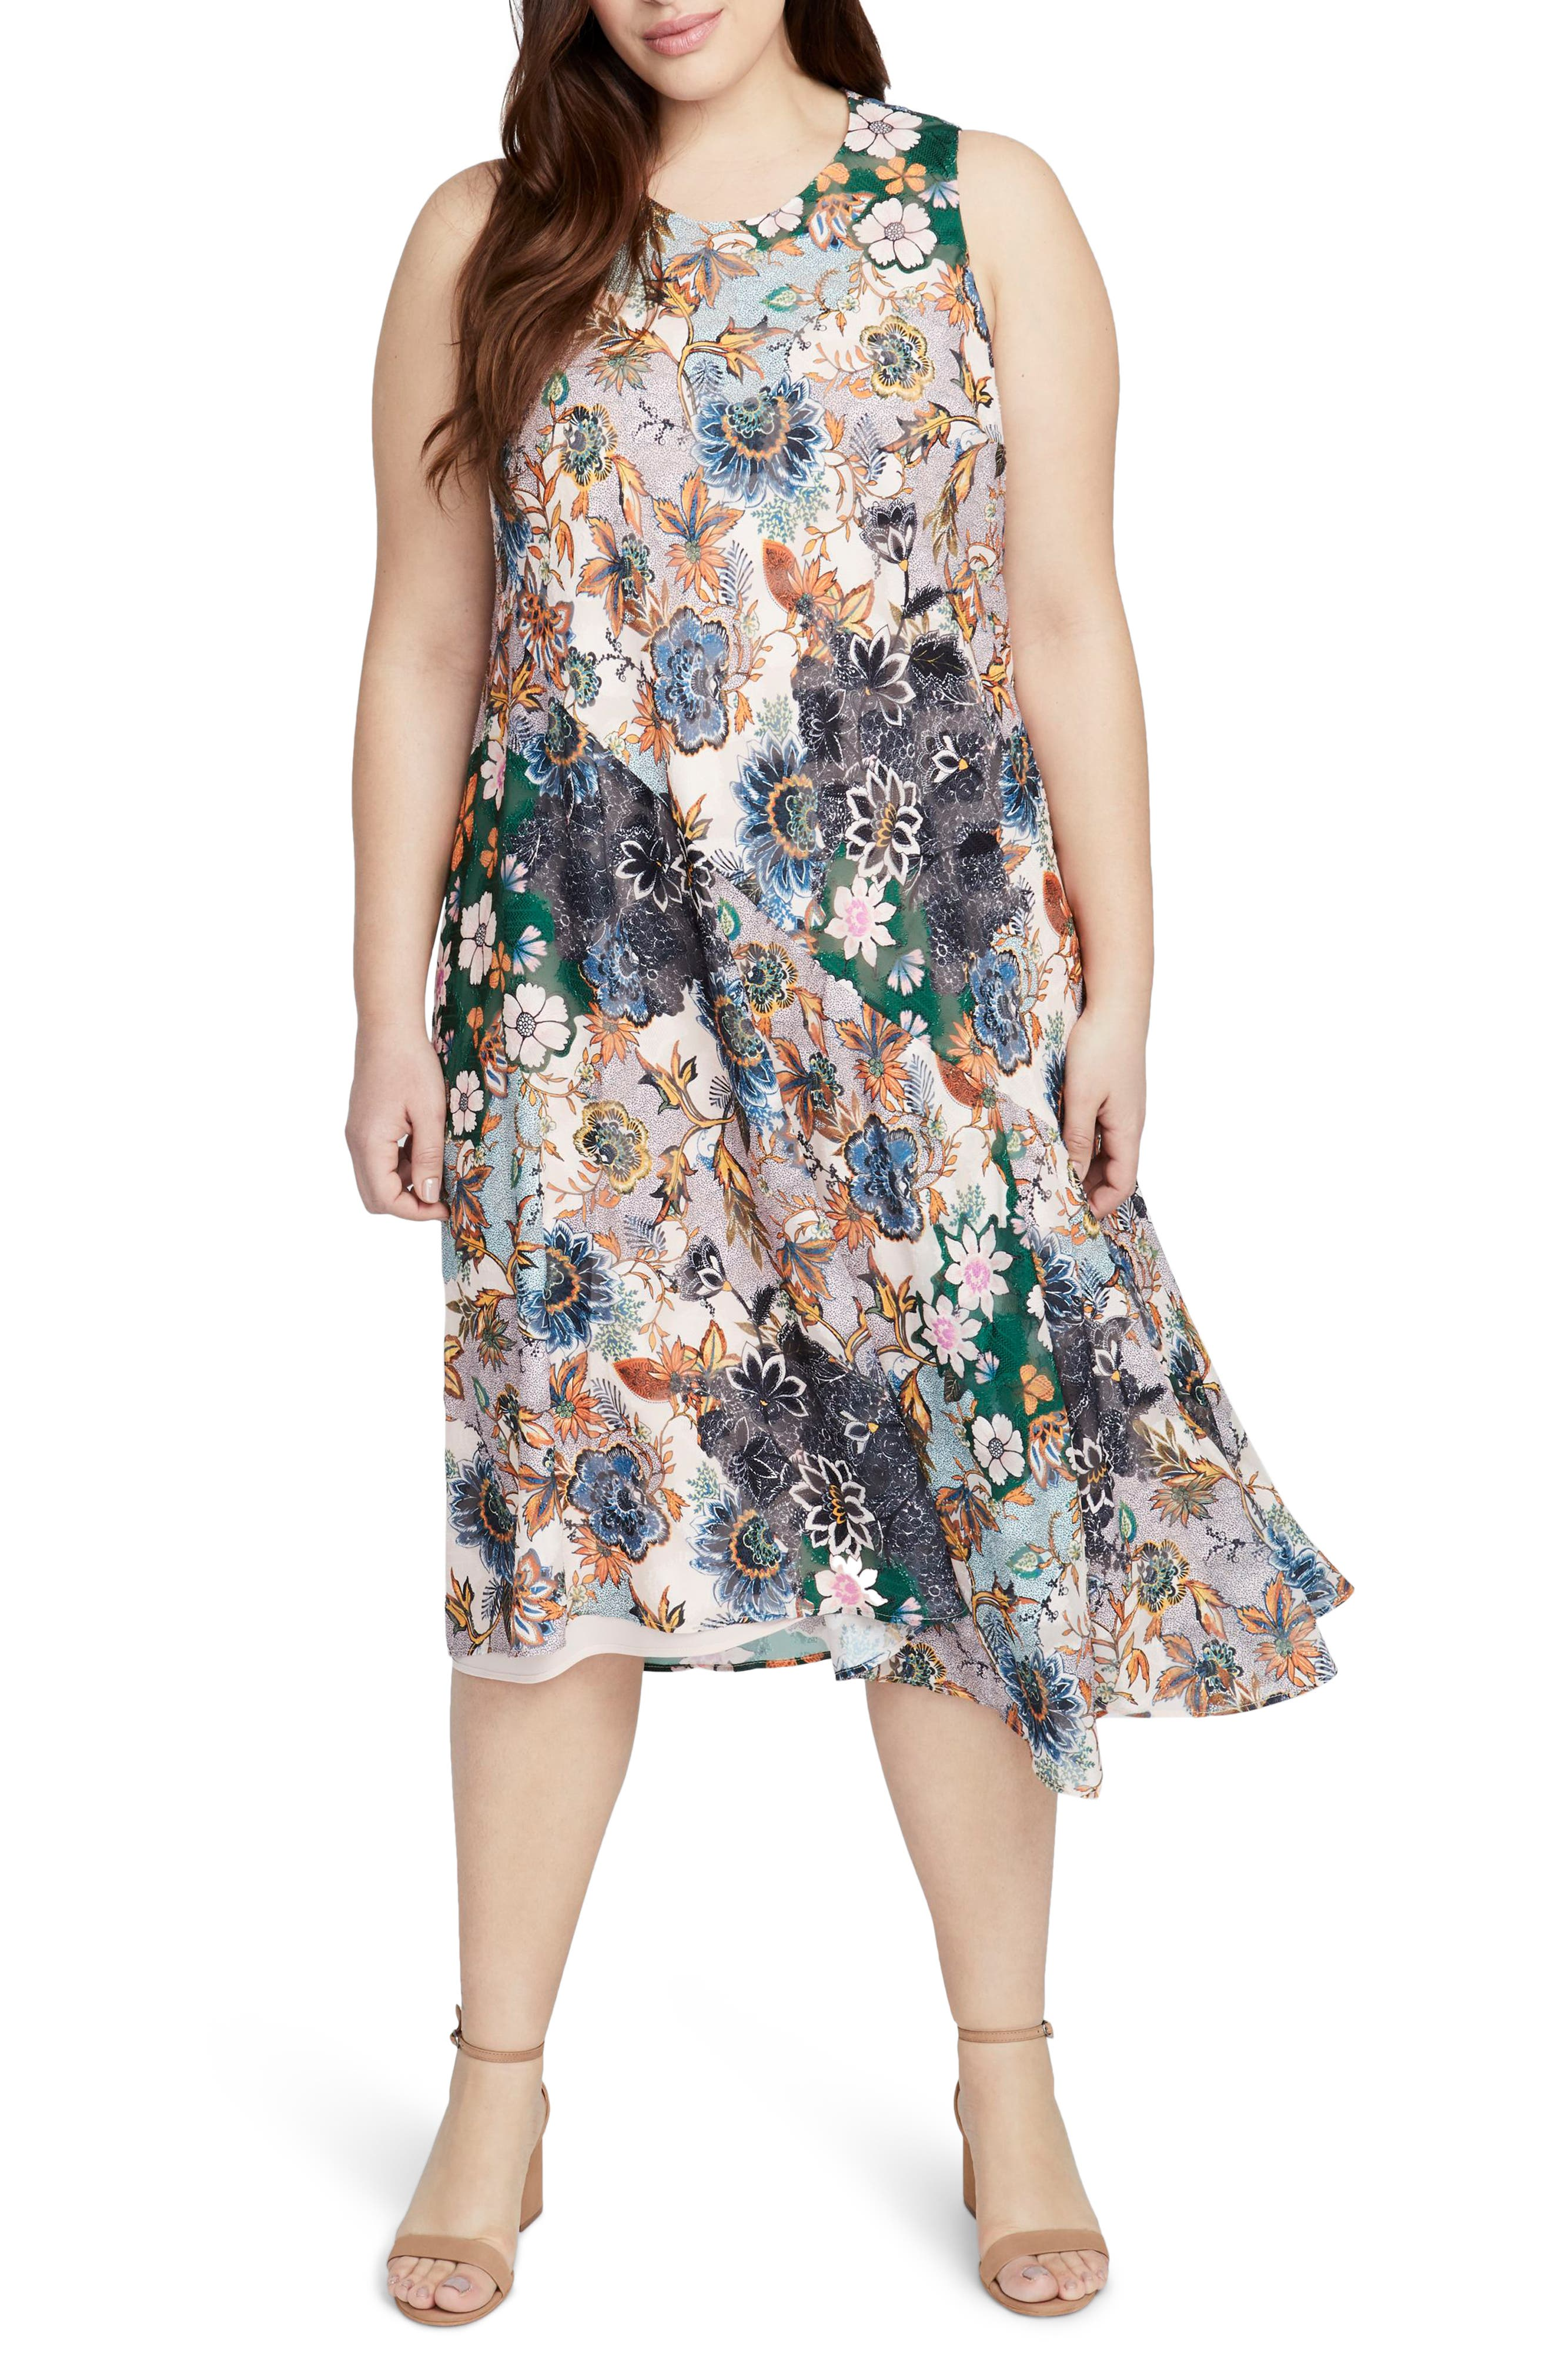 Plus Size Rachel Rachel Roy Wonderlust Scarf Dress, Pink